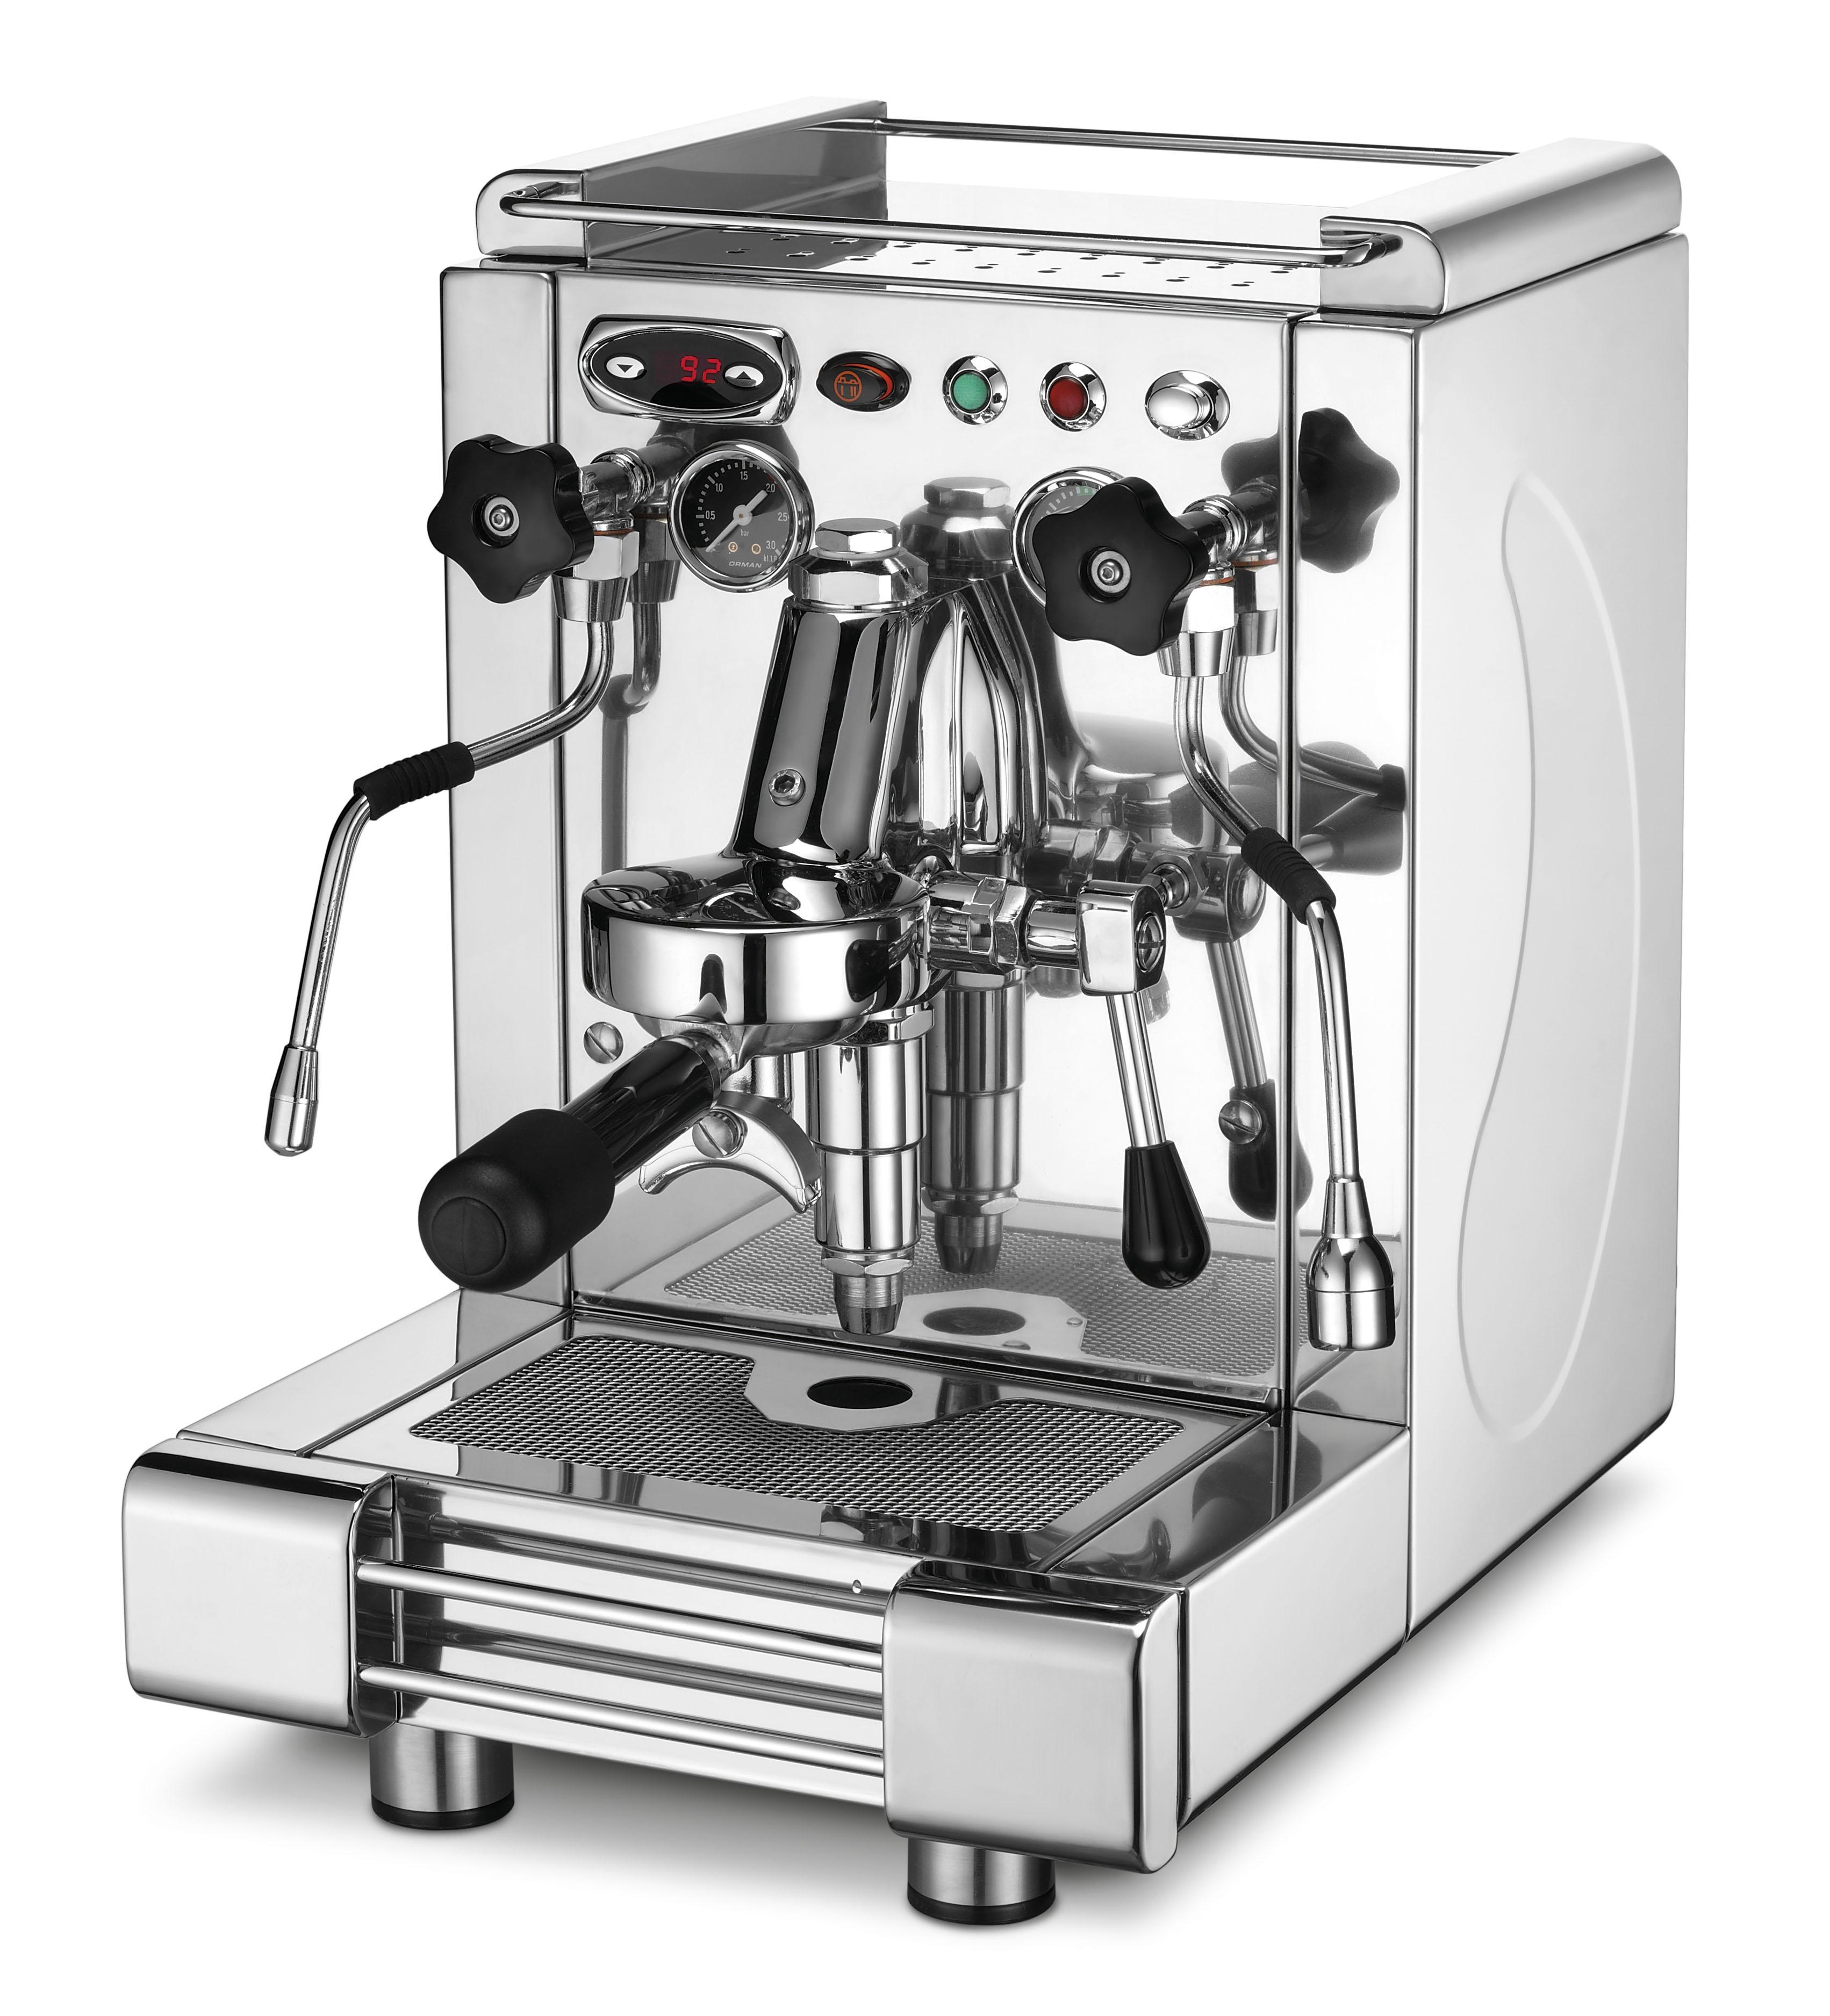 CBC Royal Espressomaschinen Neue Modelle…. | Kaffeeblog, Jura ... | {Espressomaschinen 7}